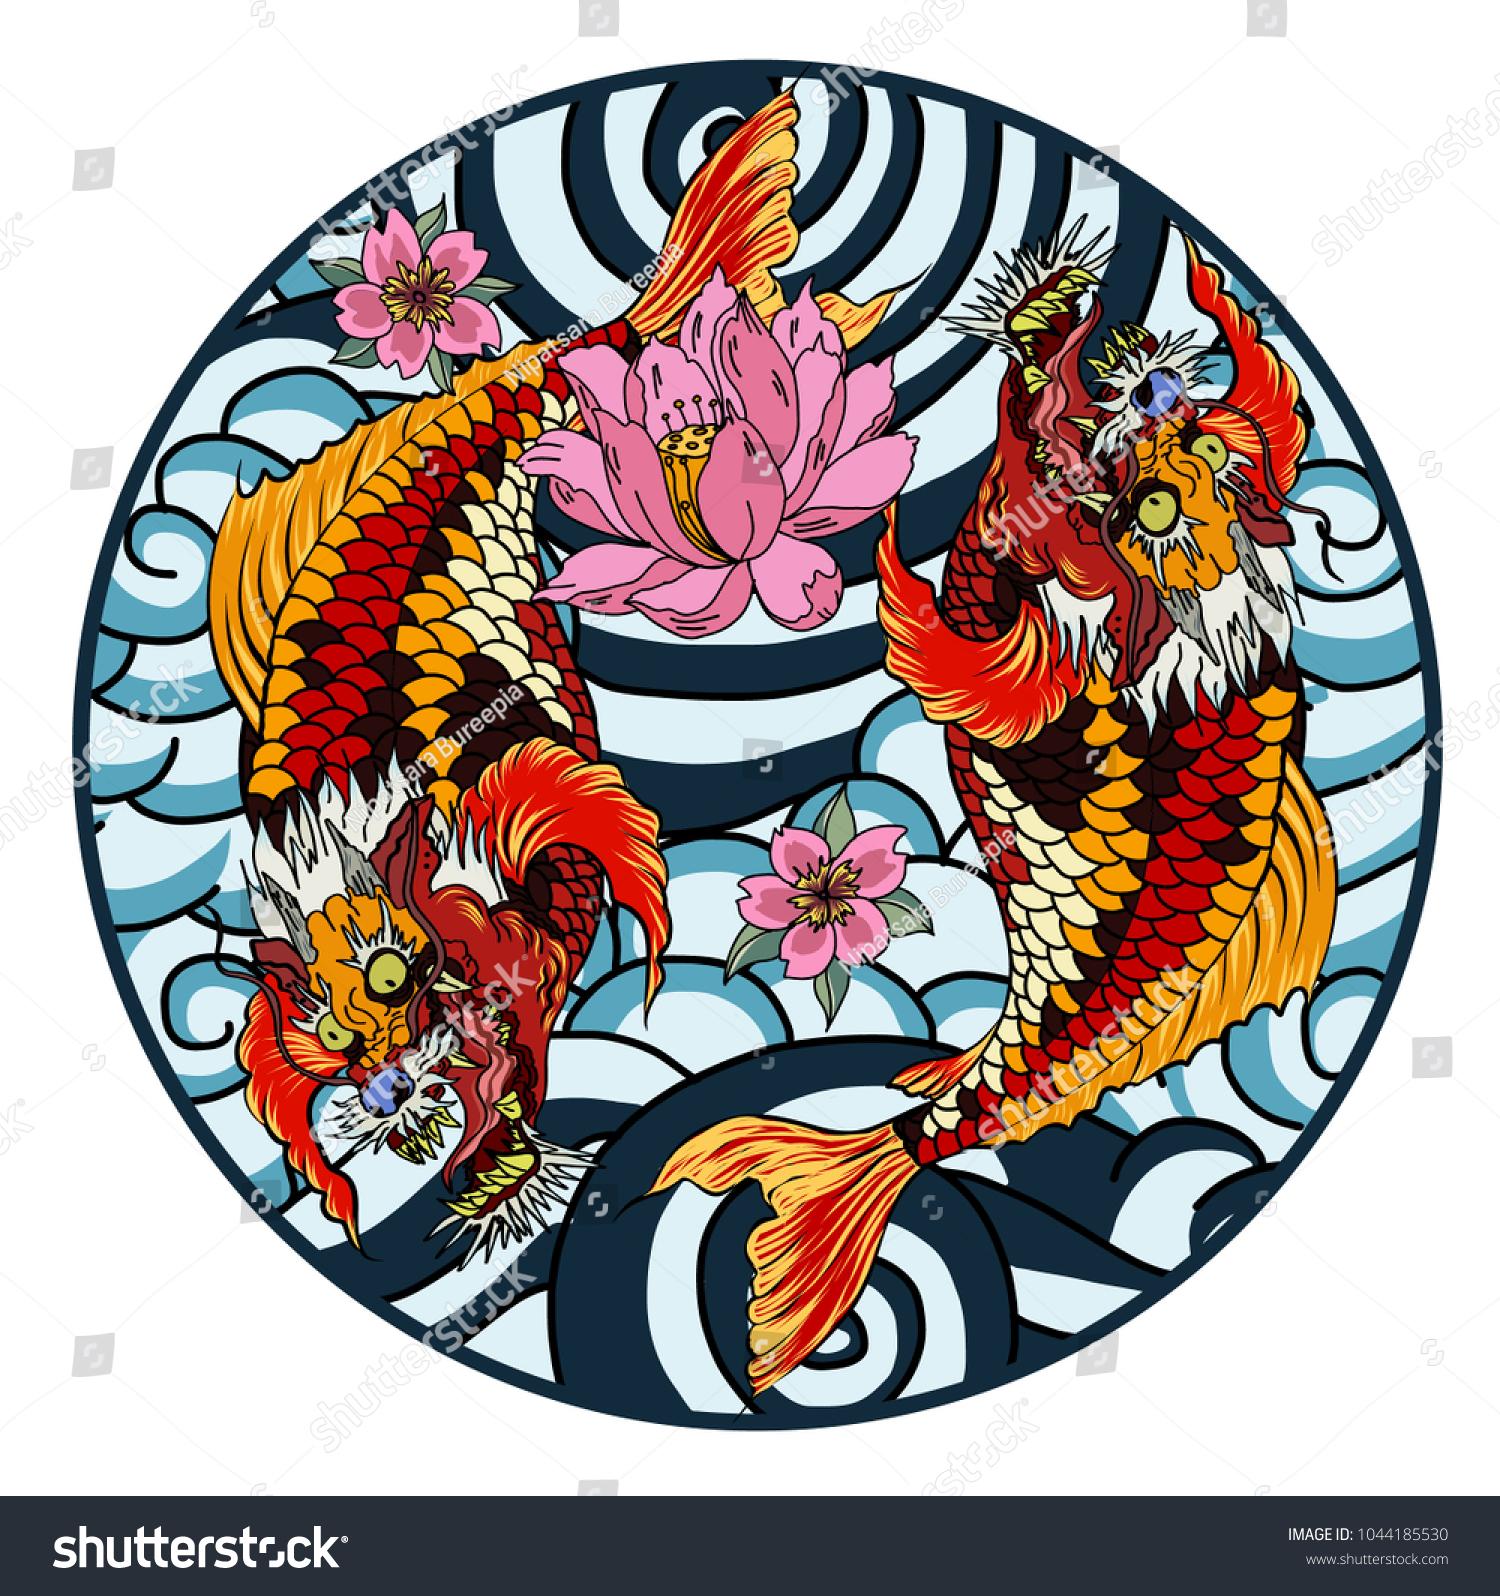 Tattoo Design Koi Dragon Cherry Blossom Stock Vector 1044185530 ...